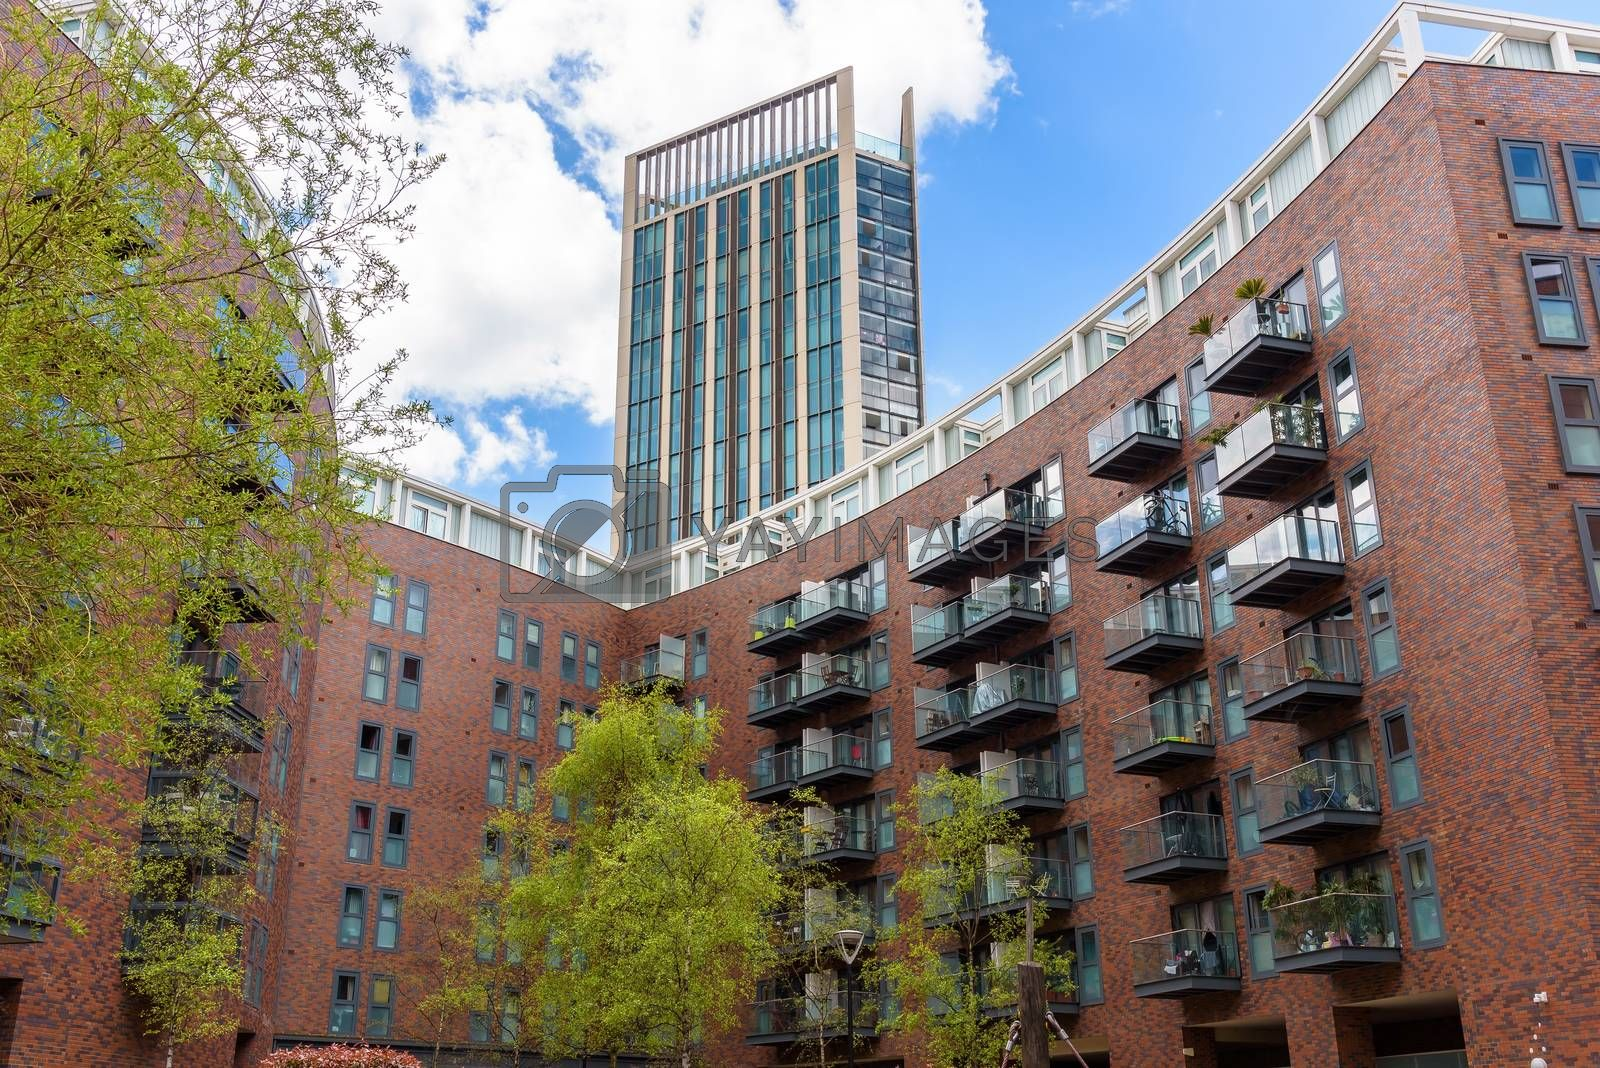 Residential buildings at Canada Water in Londons docklands, UK